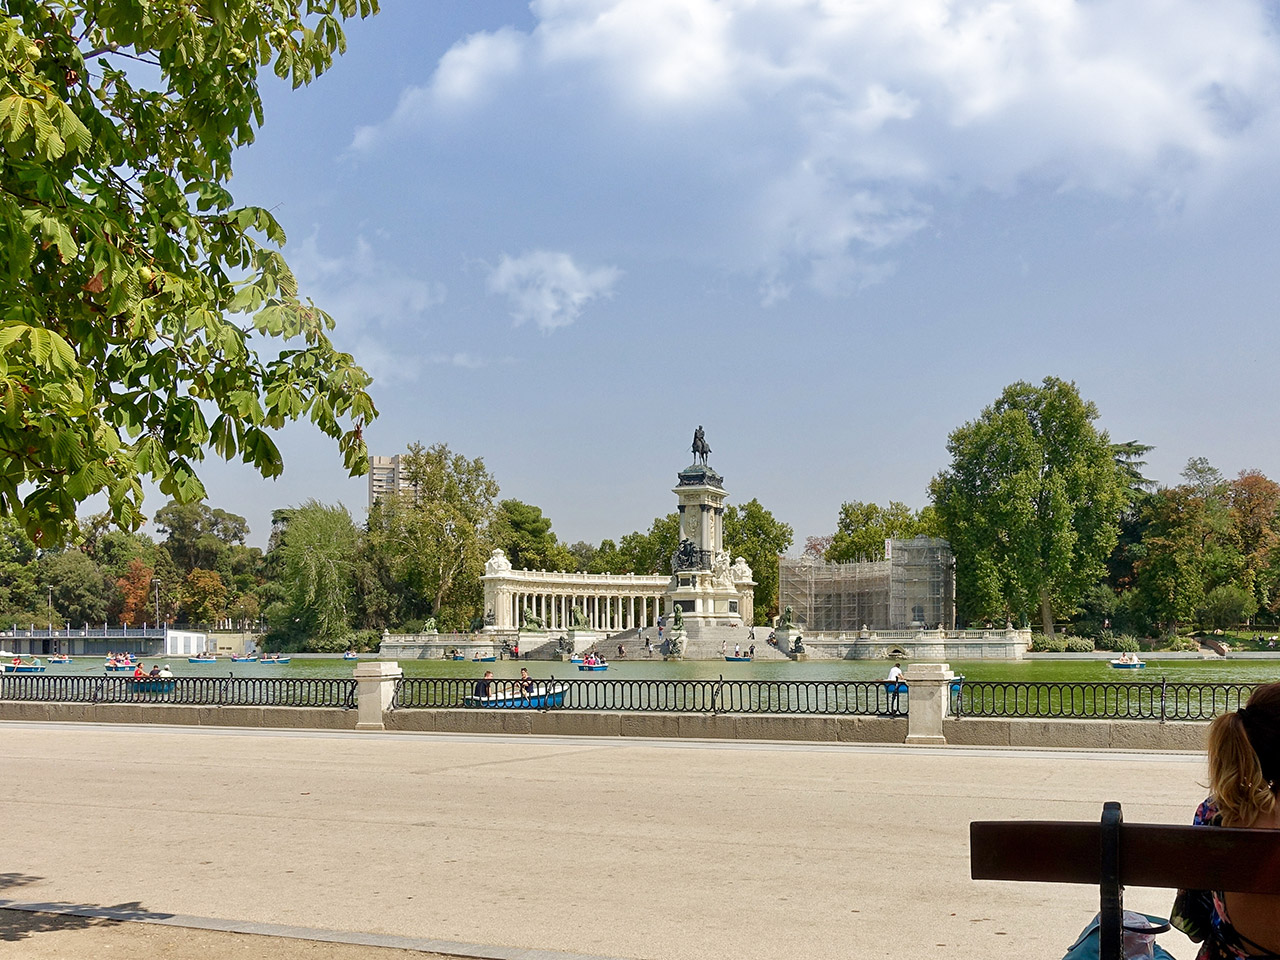 Monument für Alfons XII